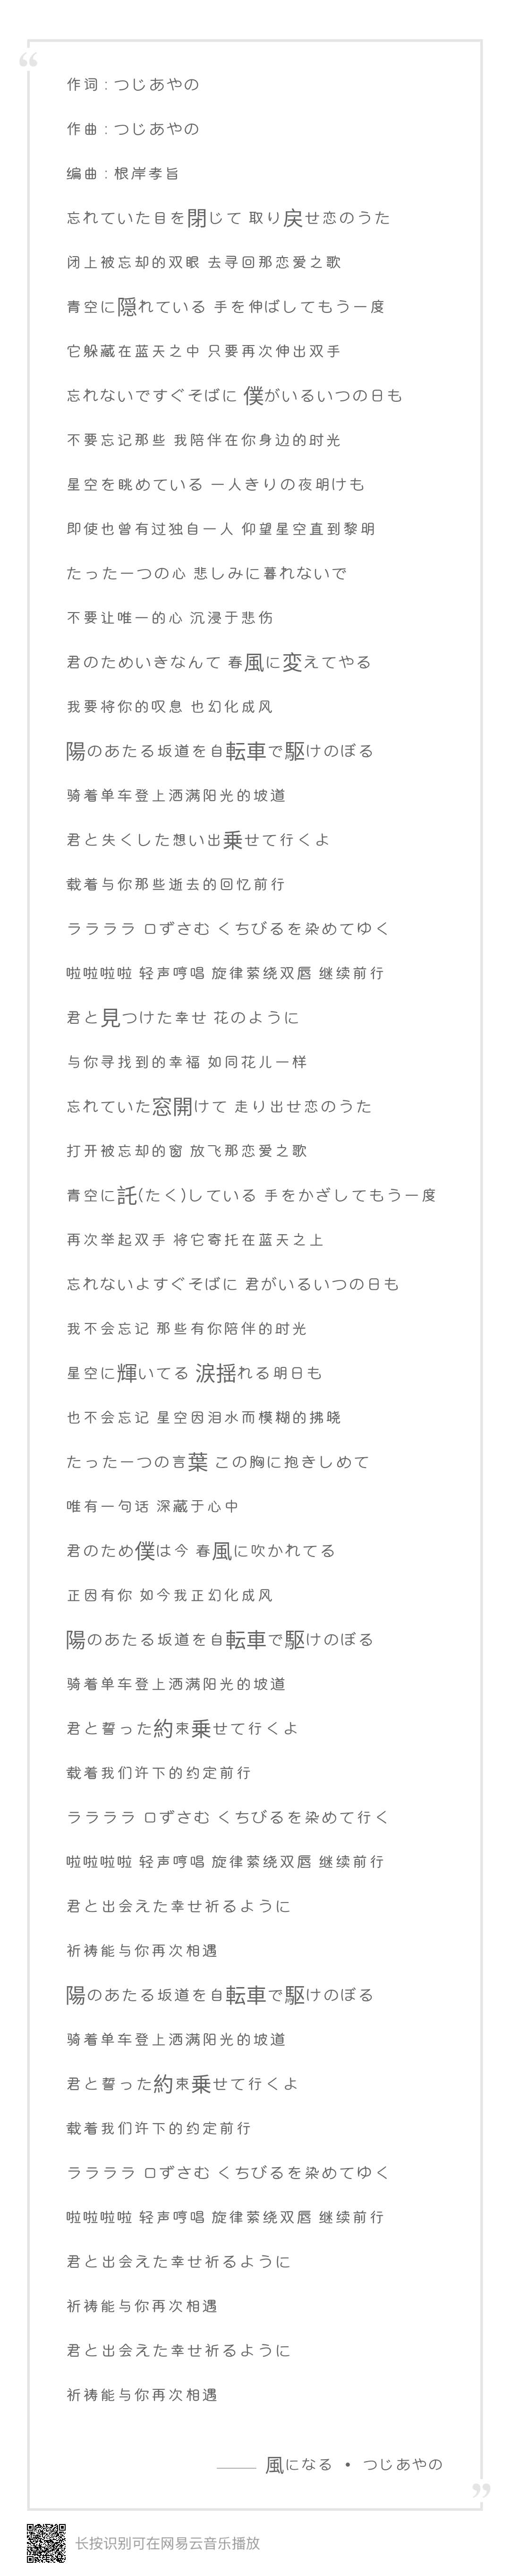 【音乐】風になる (幻化成风 (动画电影《猫的报恩》主题曲)-小柚妹站